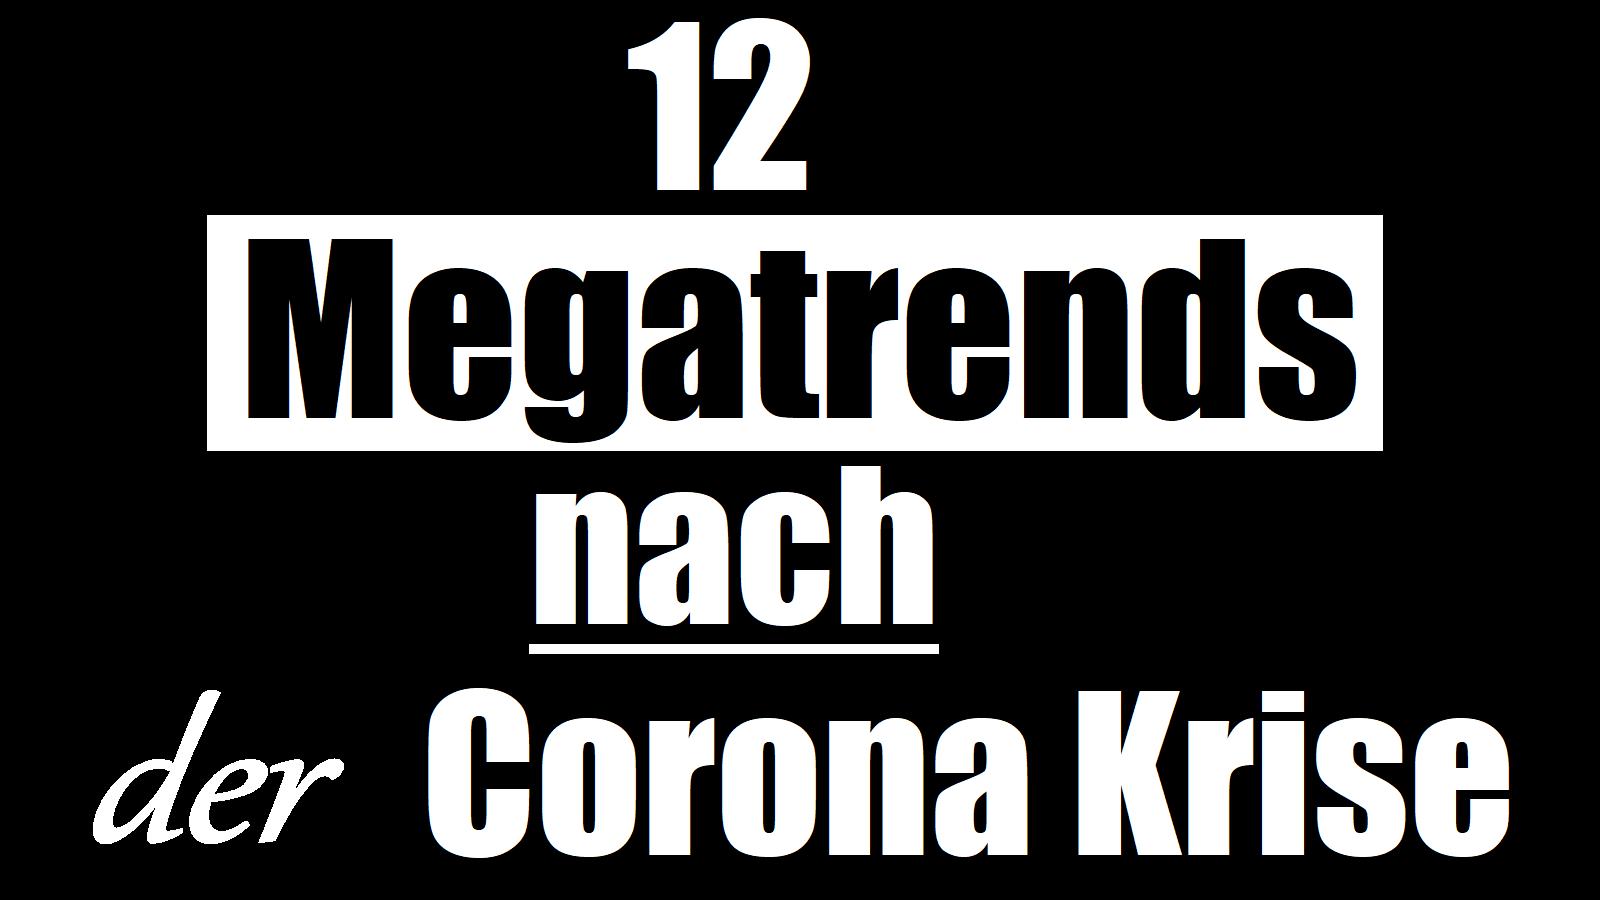 Megatrends nach Corona Krise